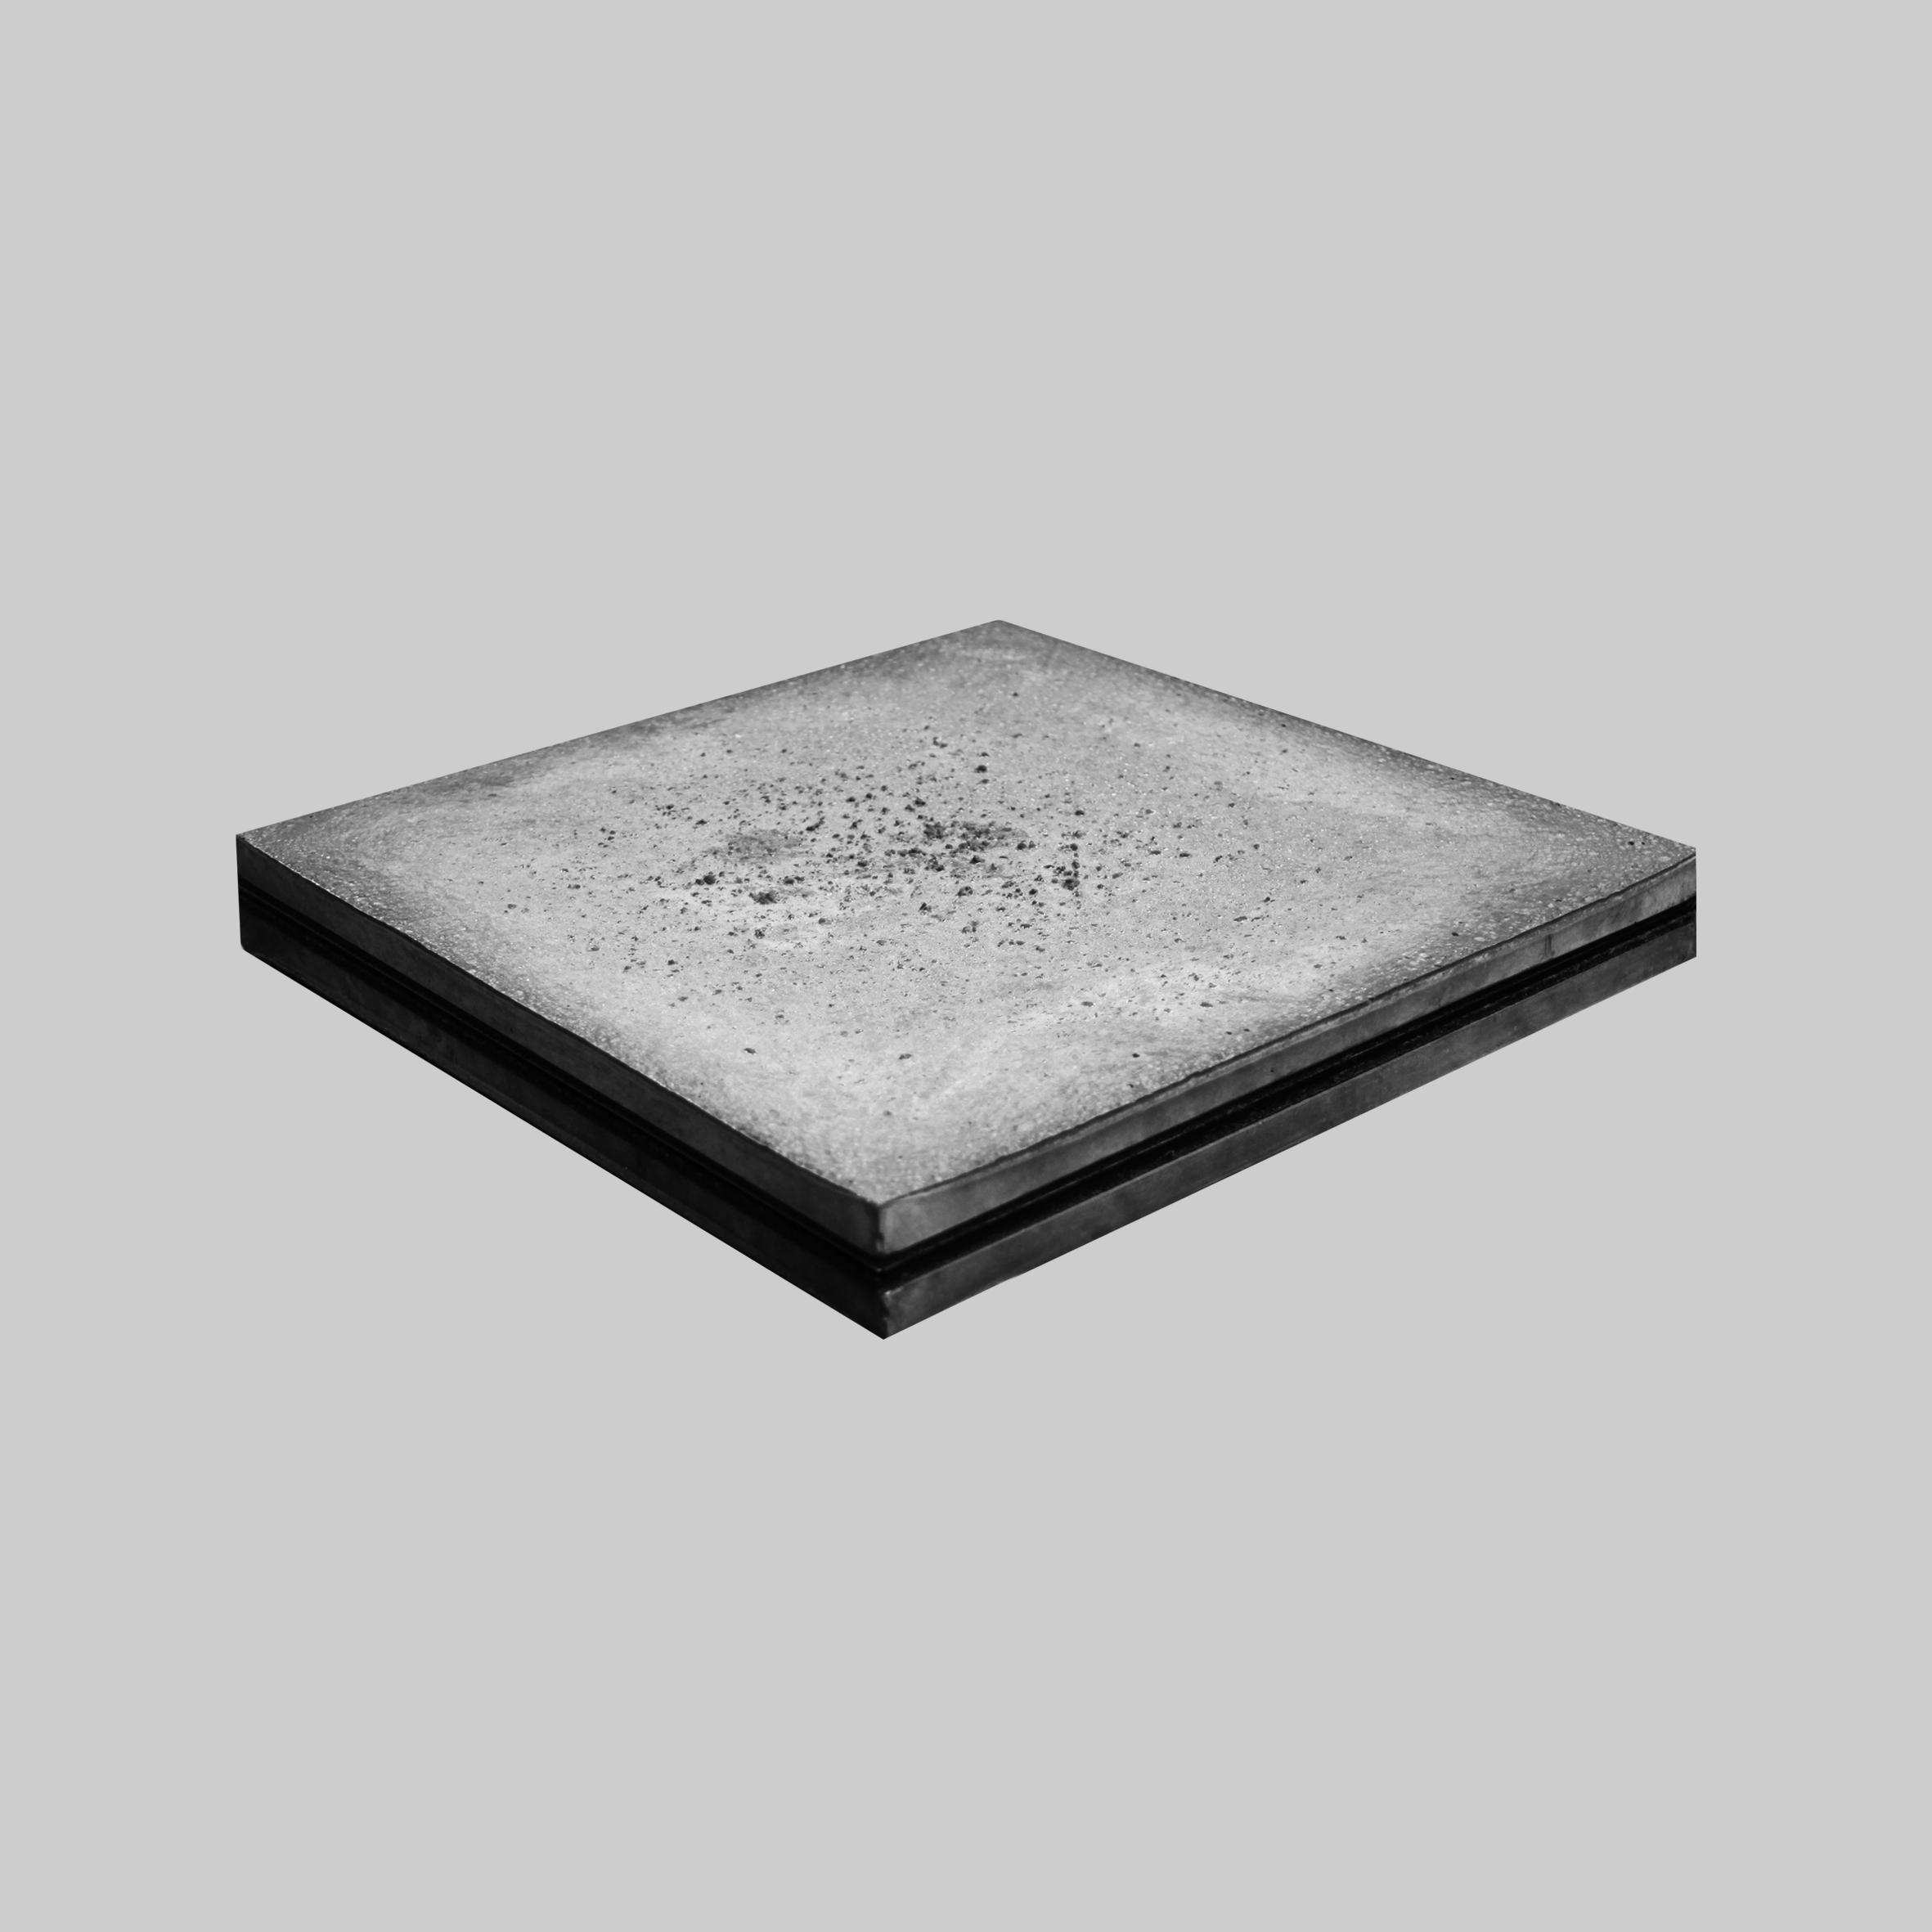 concrete 5.jpg